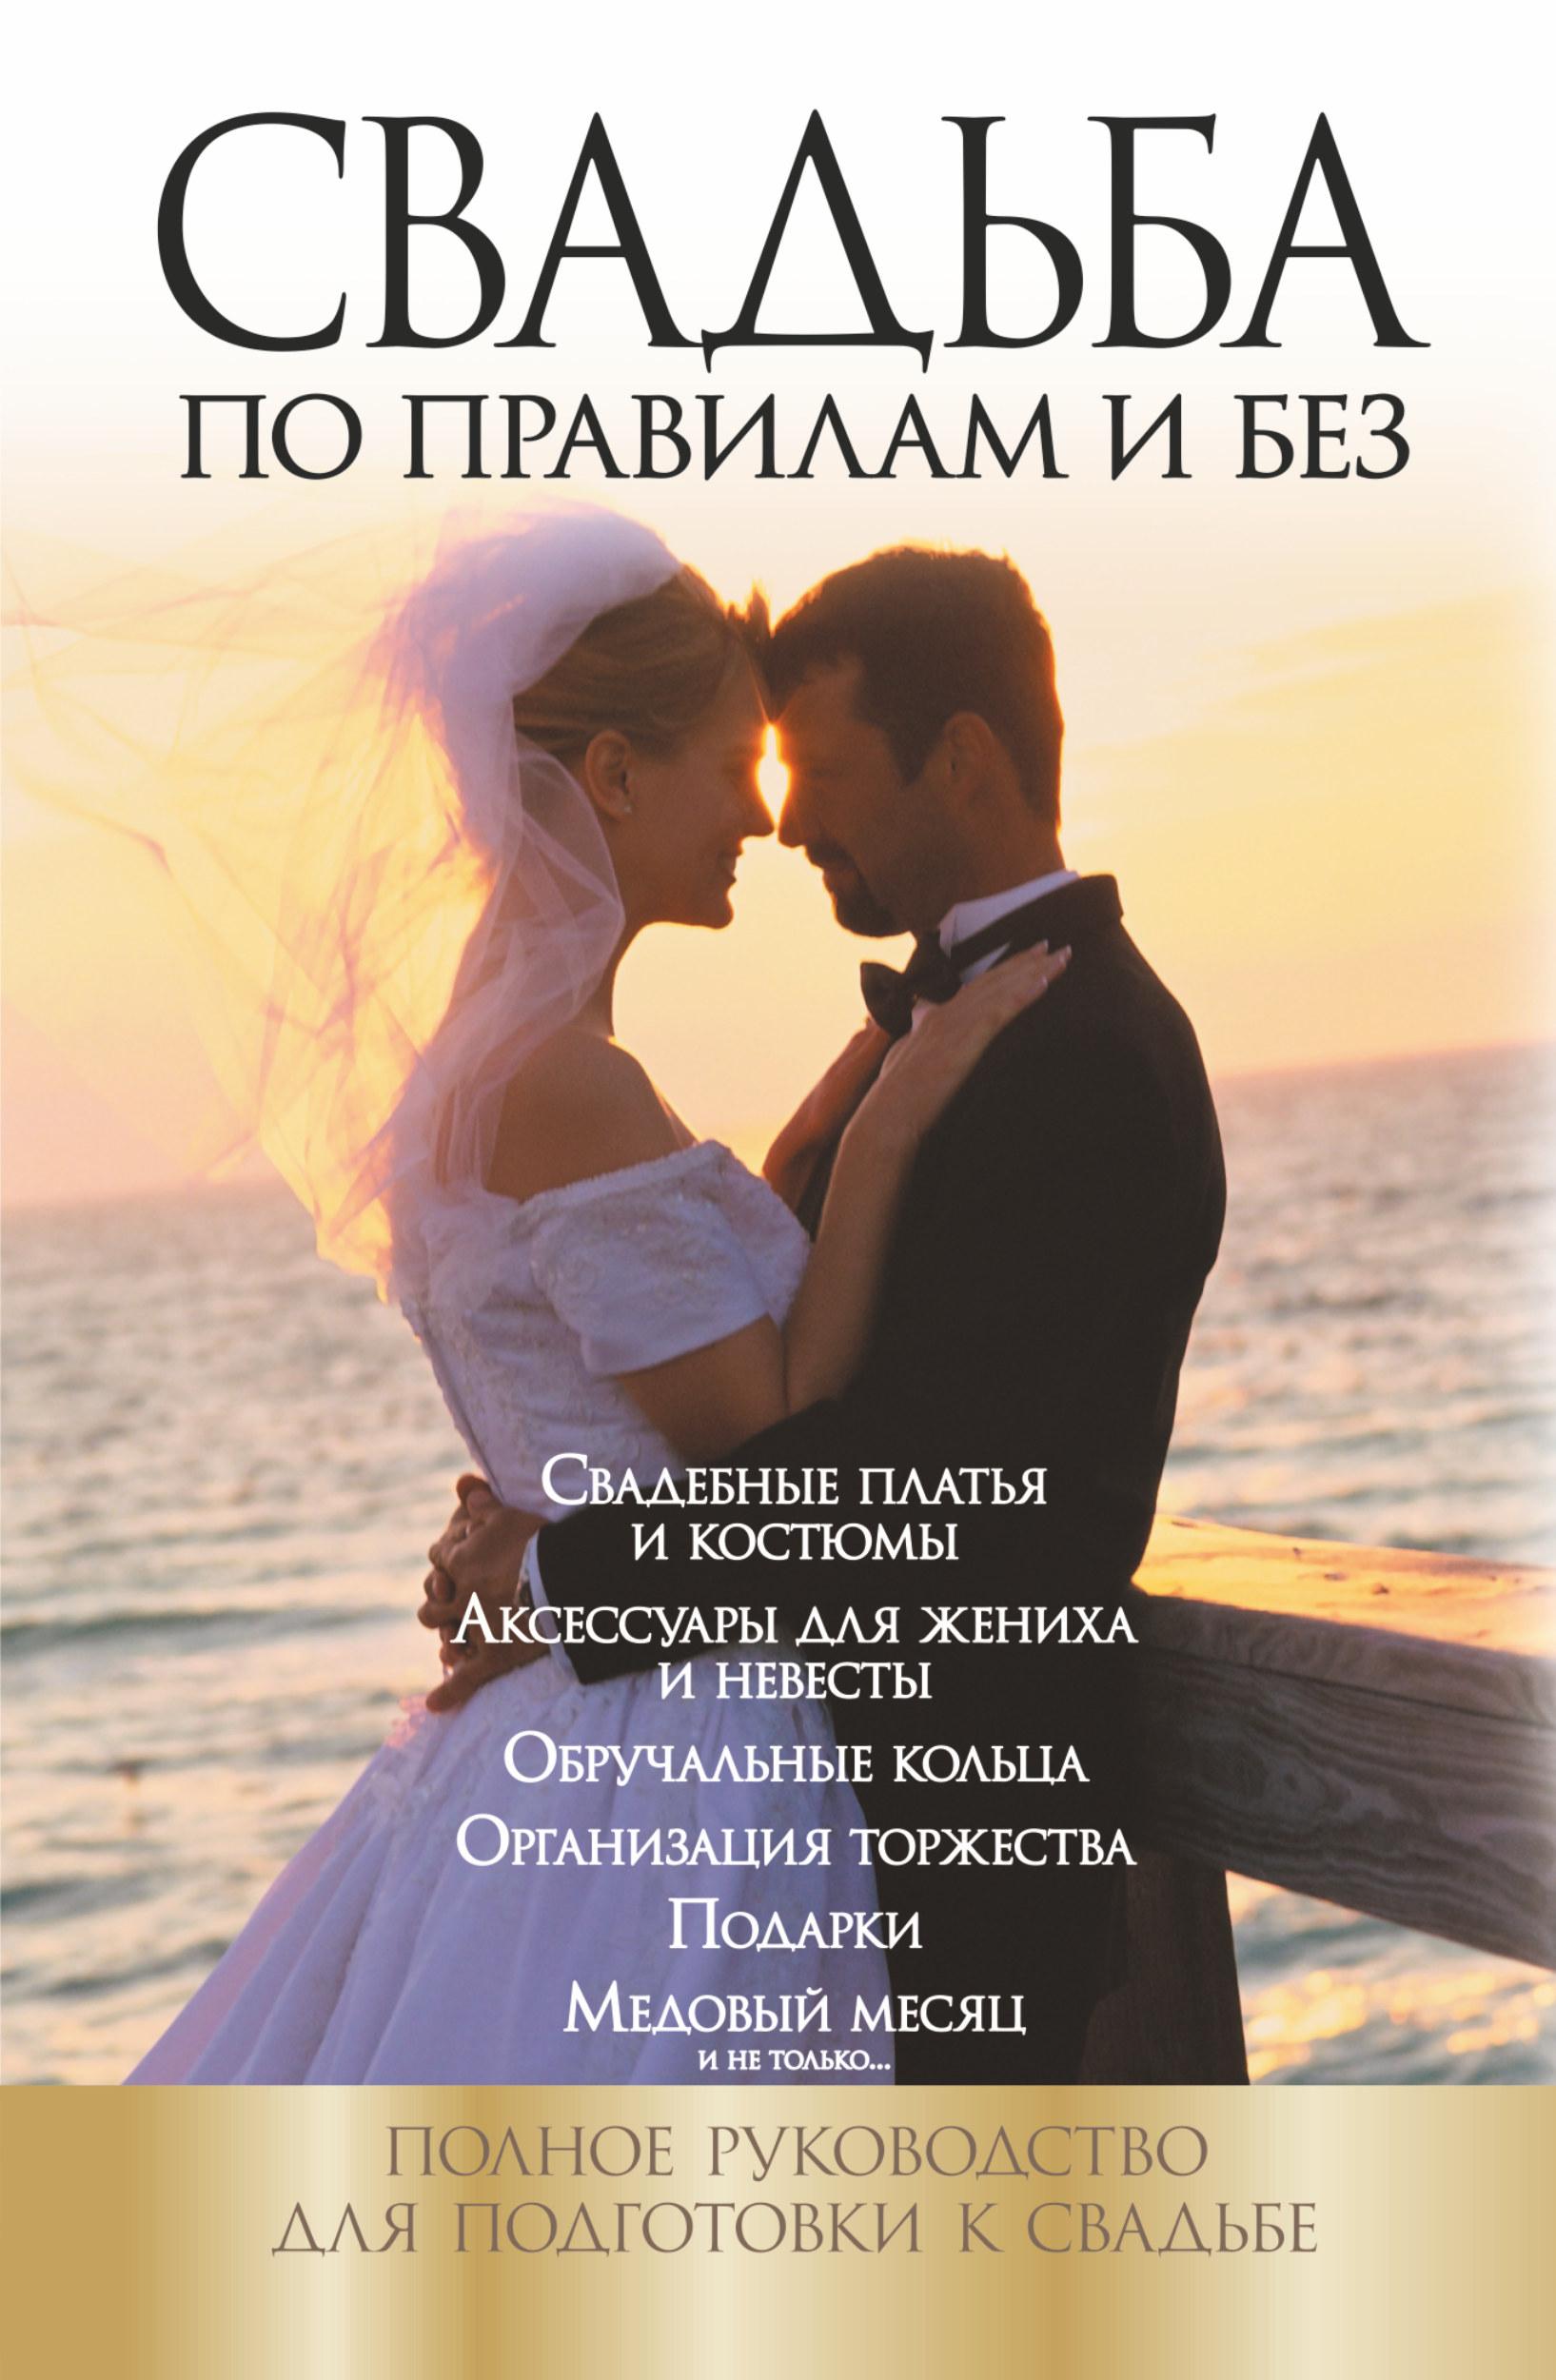 Свадьба по правилам и без ( Криштоп Н.  )